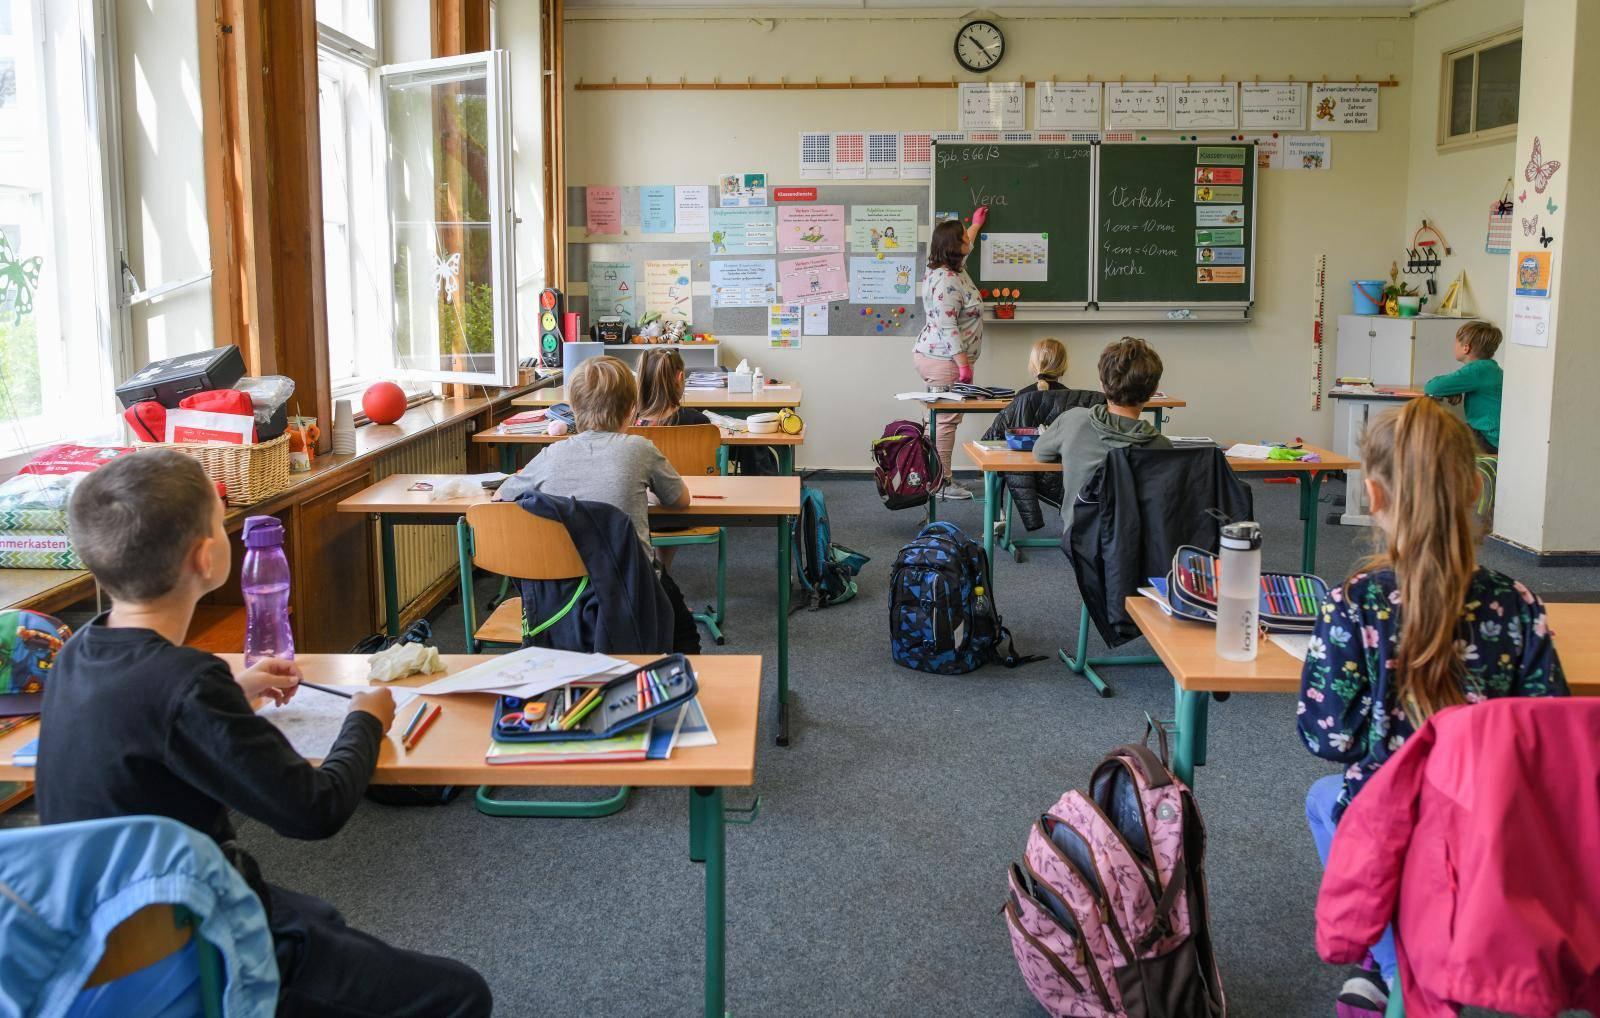 Coronavirus - preparation for the start of school